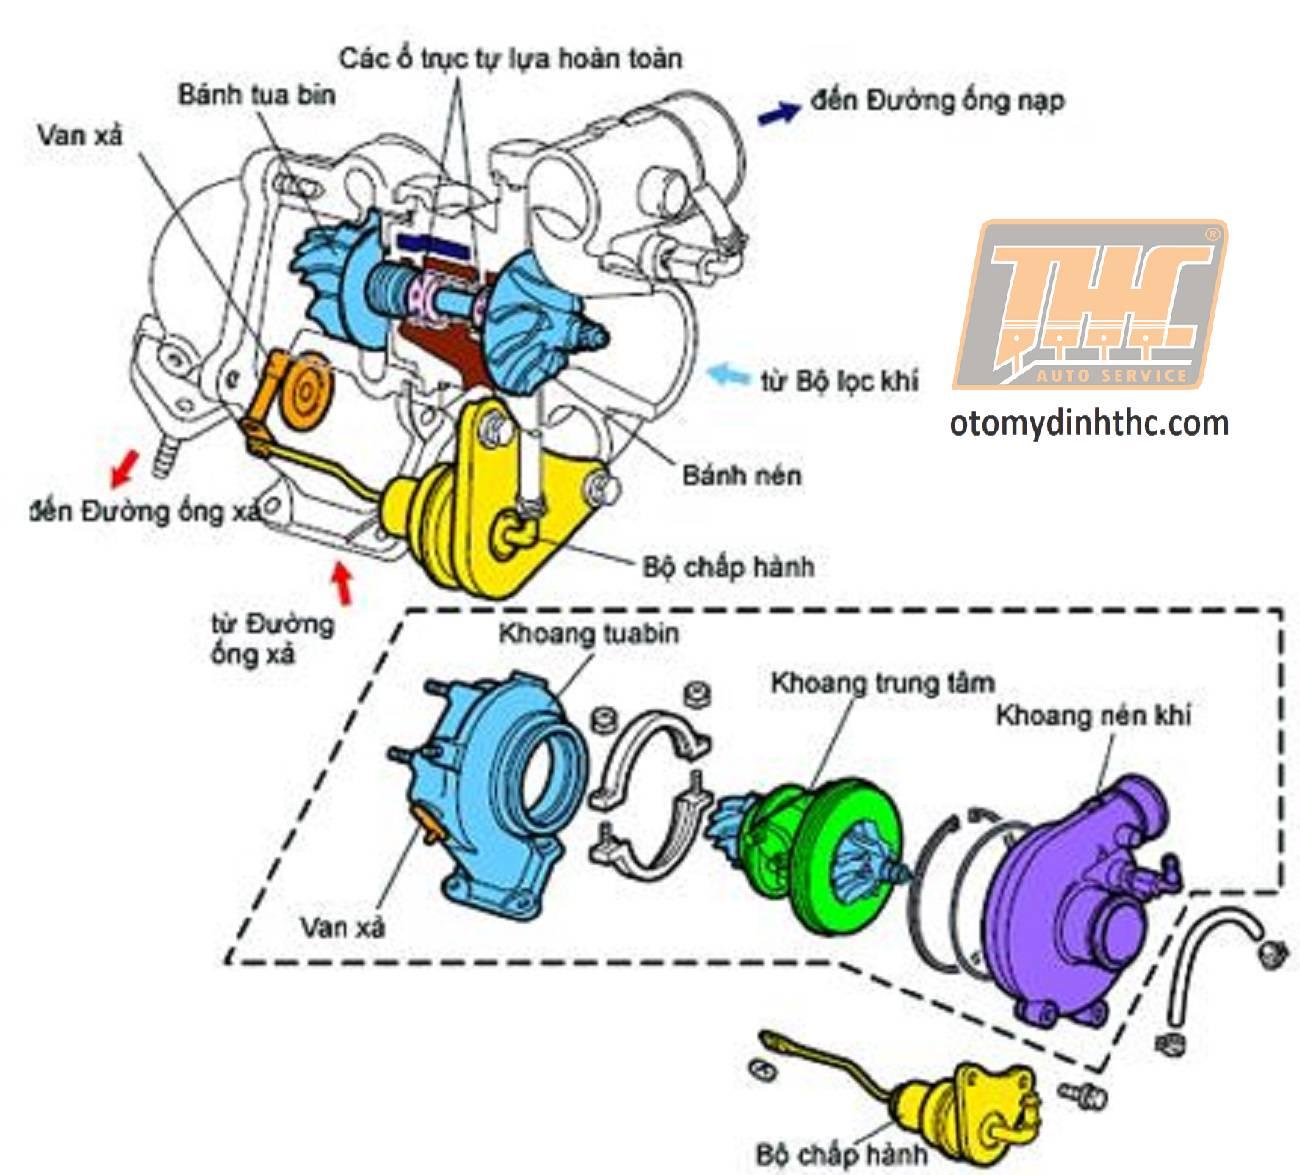 turbo-tang-ap-dong-co-oto-2